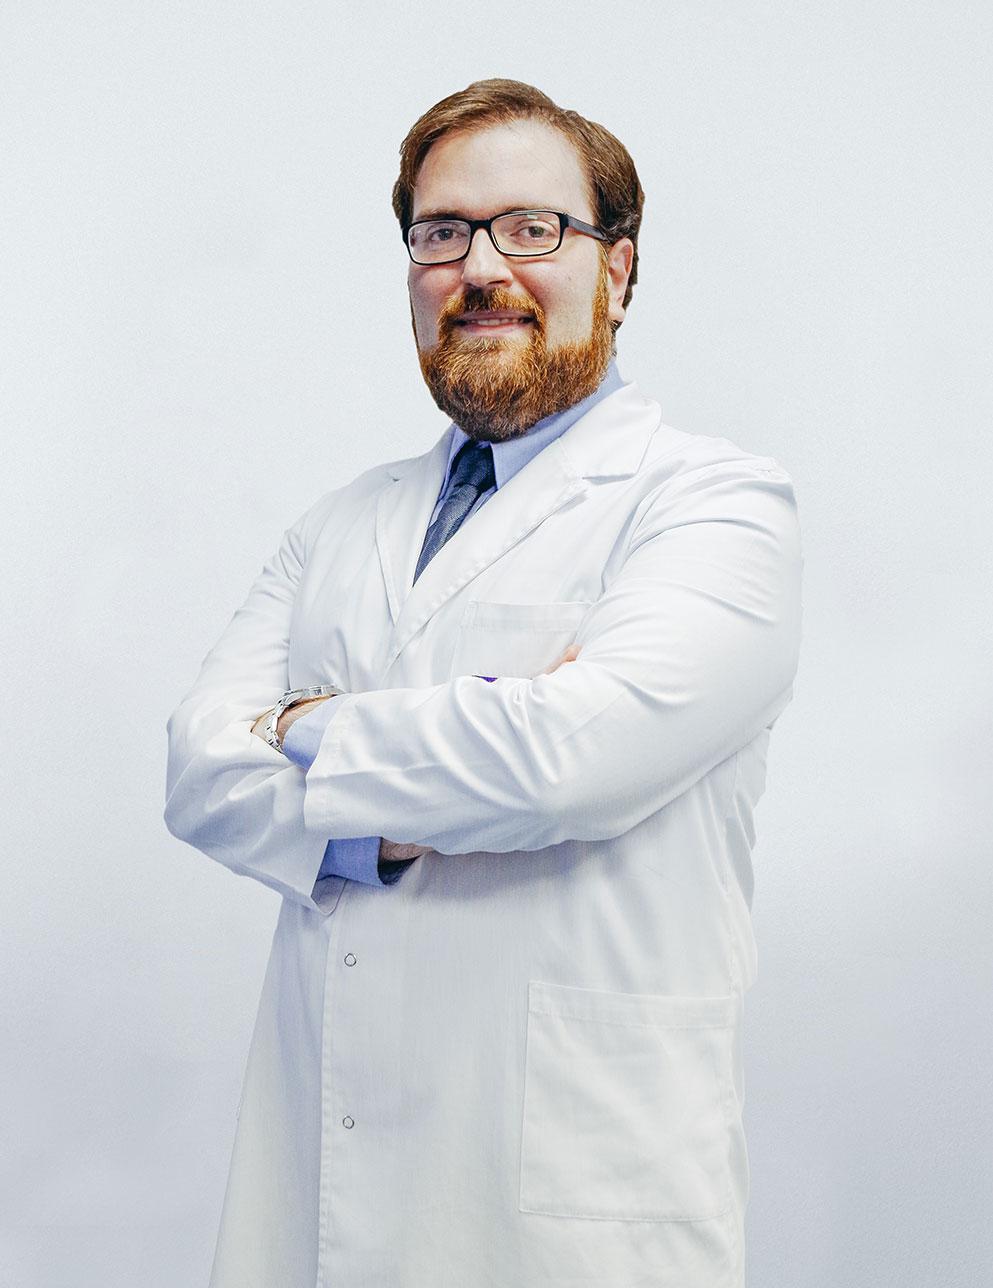 Dr. Bruce Patrik dos Santos